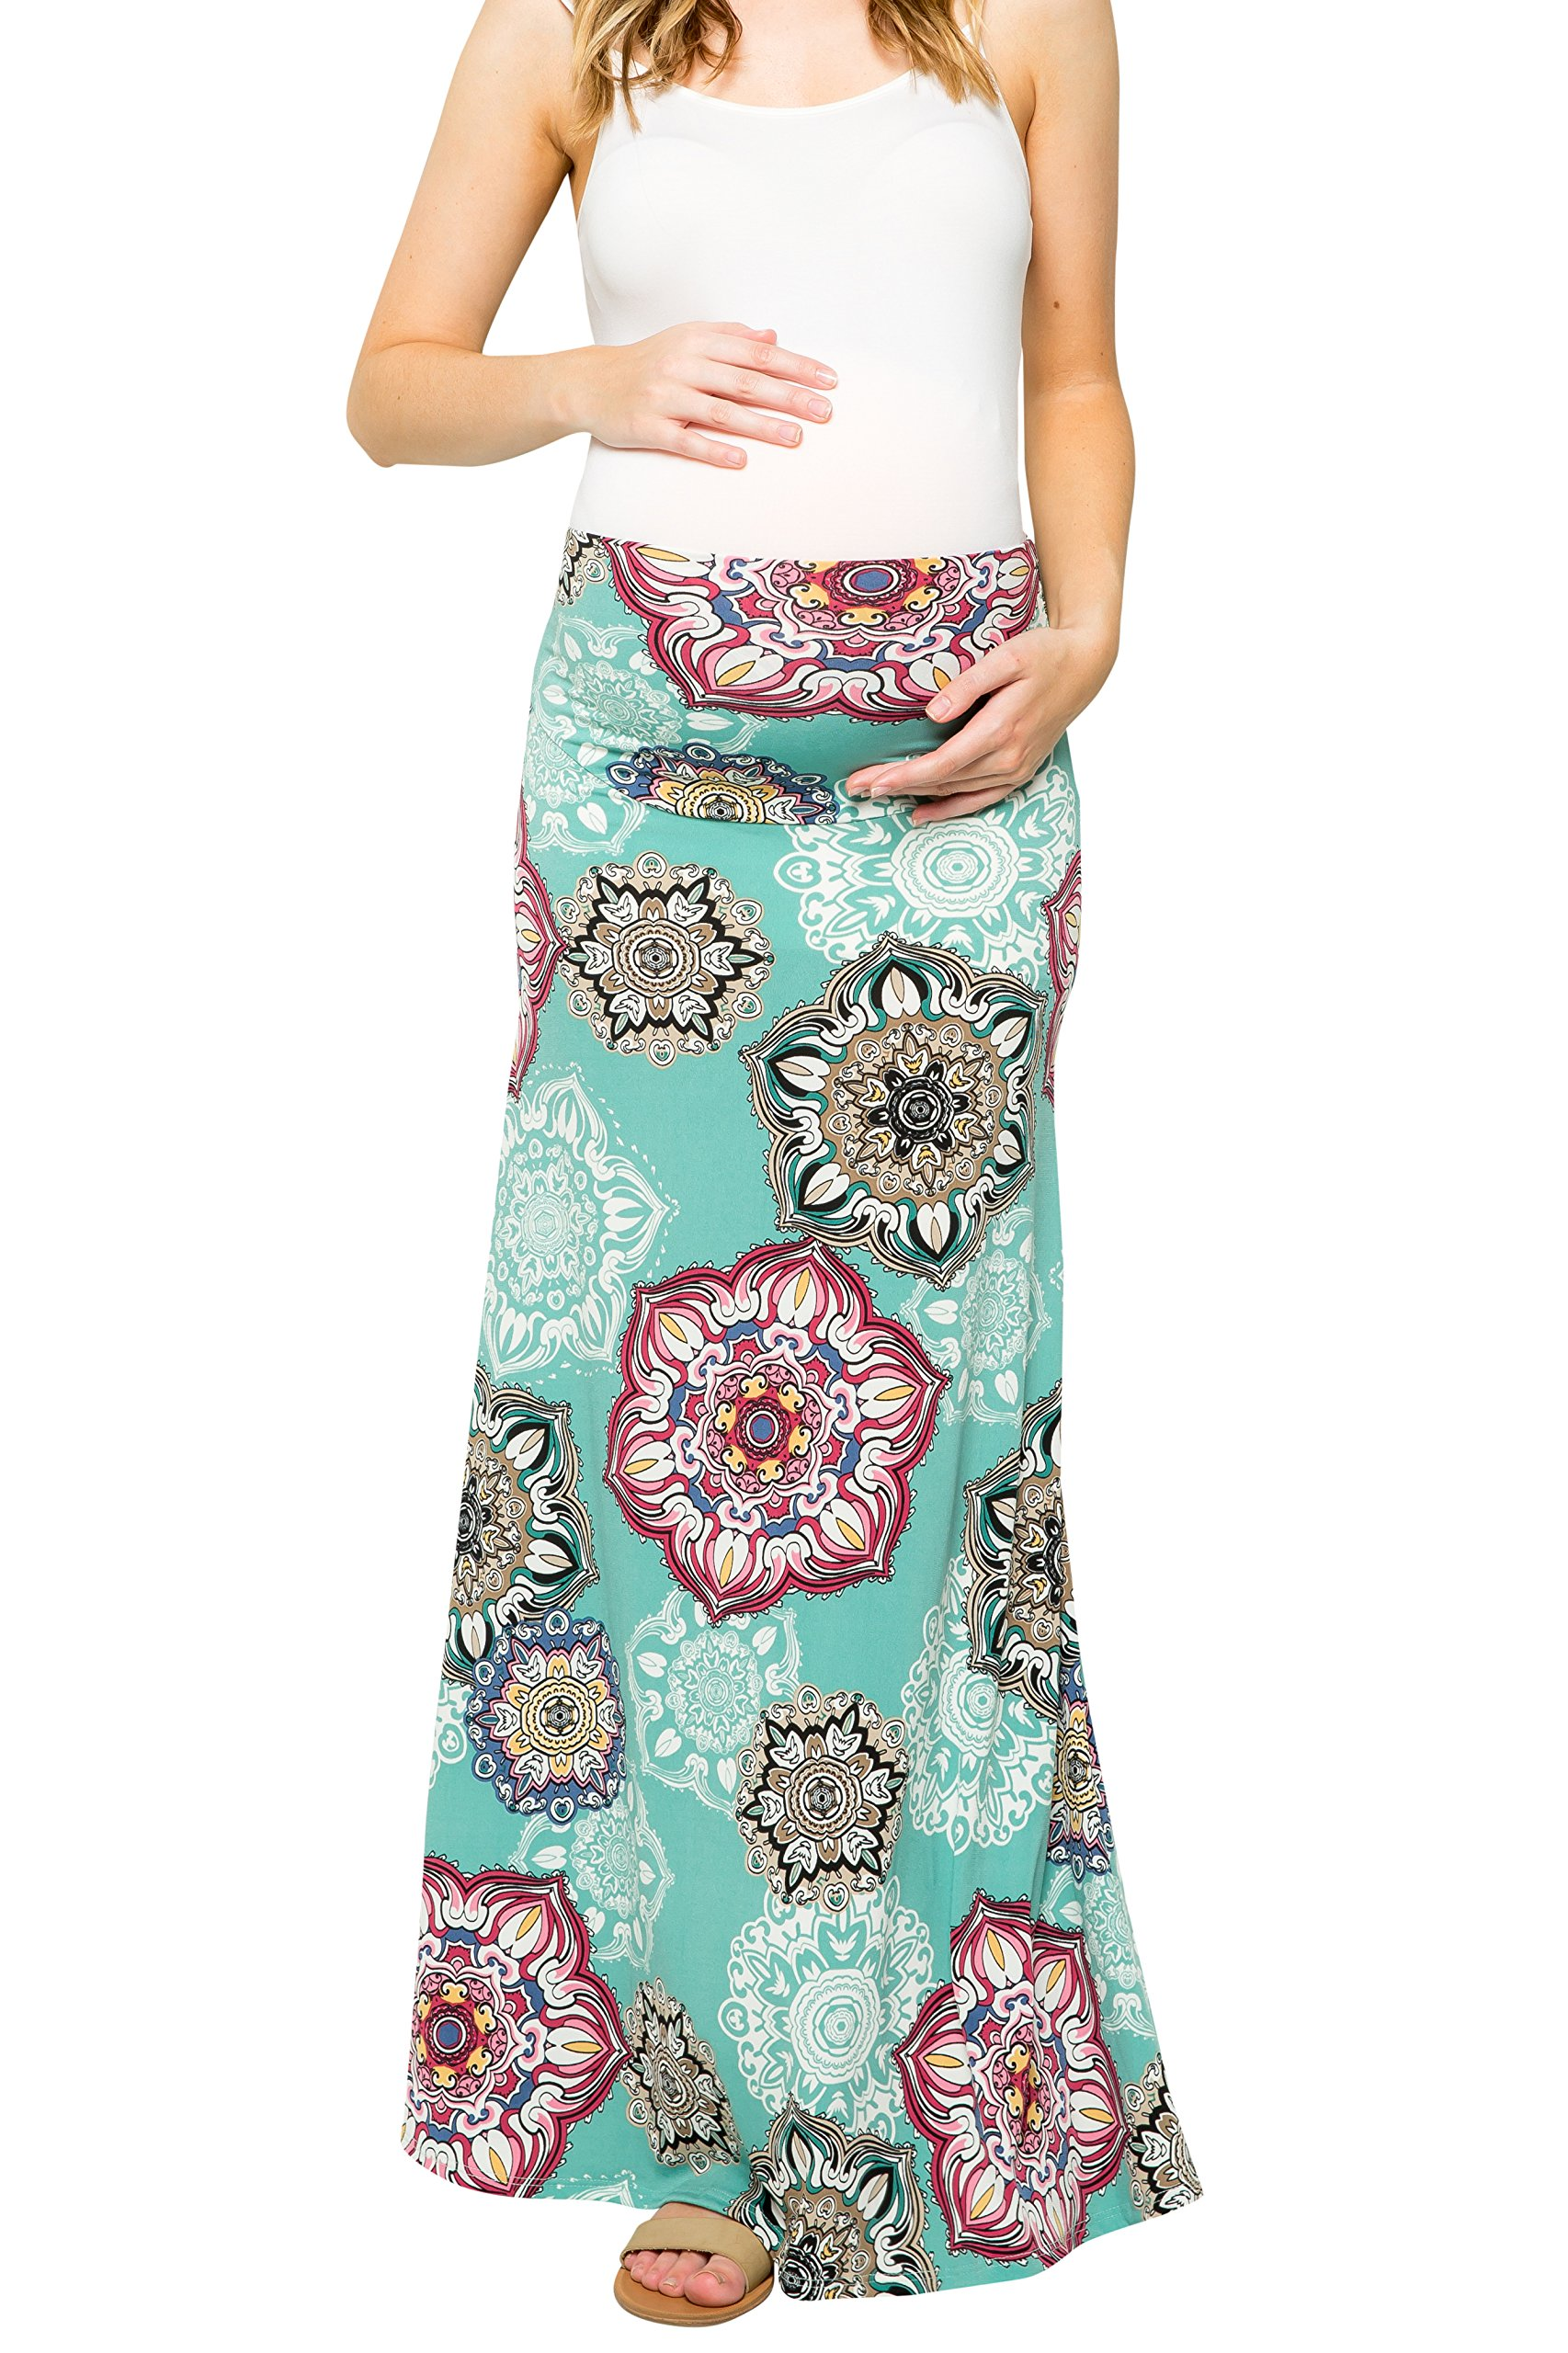 My Bump Women's Maternity Maxi Skirt with Tummy Control(Made in U.S.A) (Medium, Mint/Burgundy SKAA)